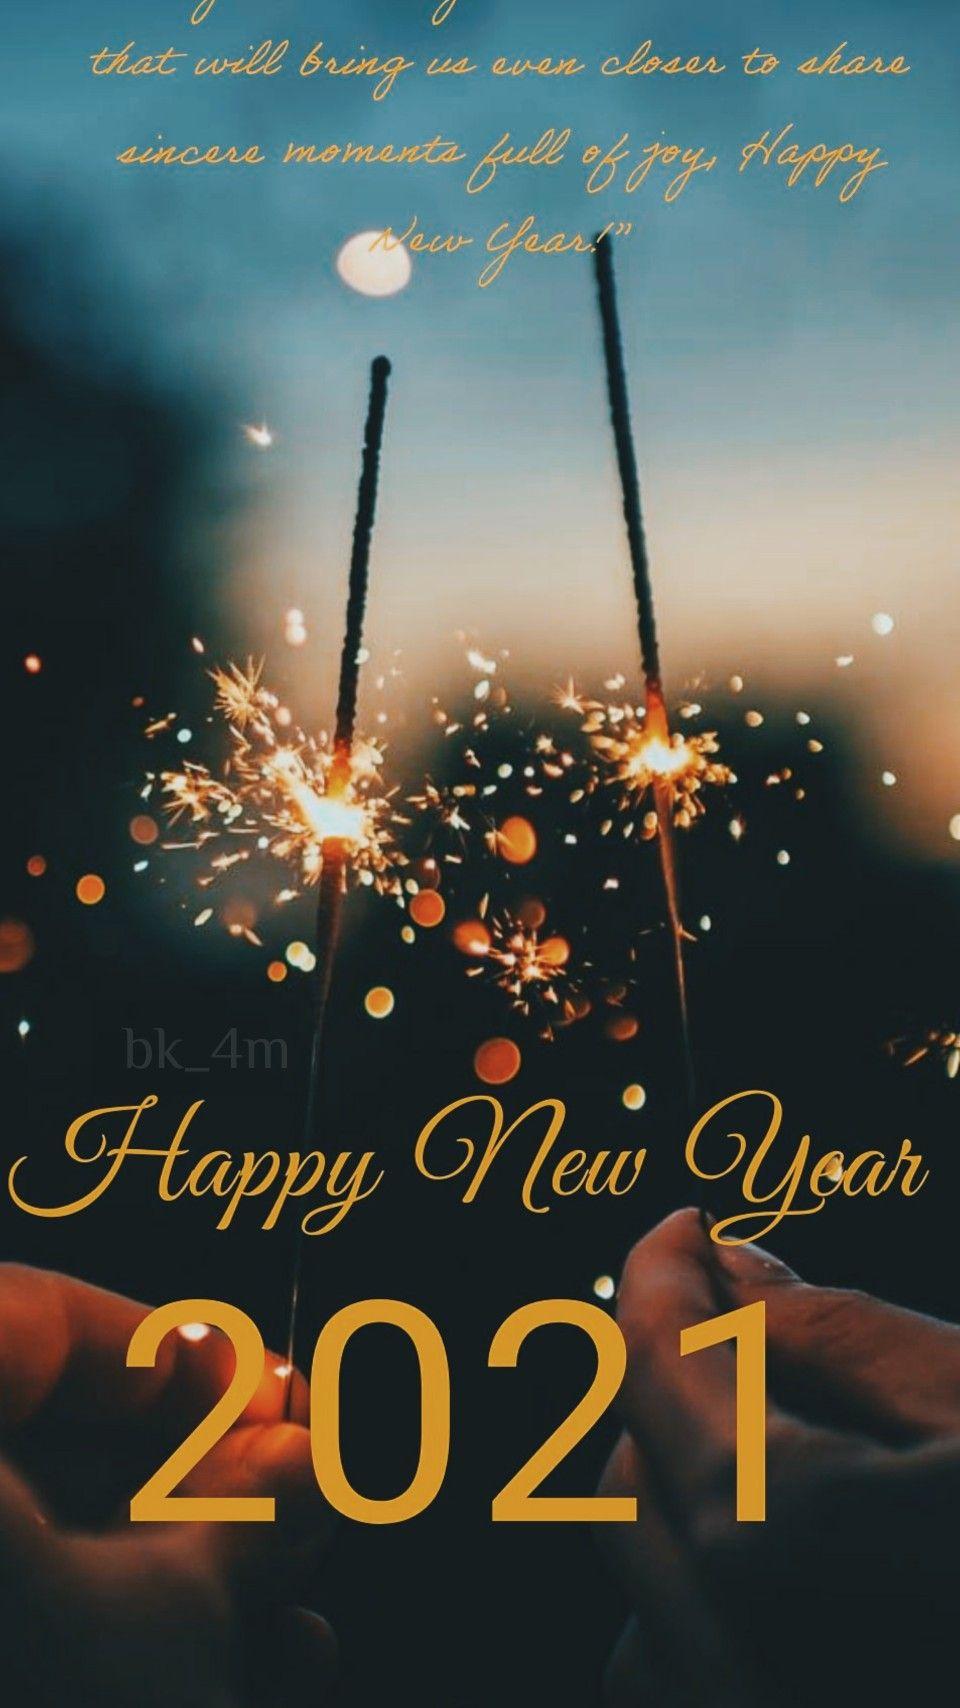 Happy New Year Pictures Happy New Year Pictures Happy New Year Images Happy New Year Greetings